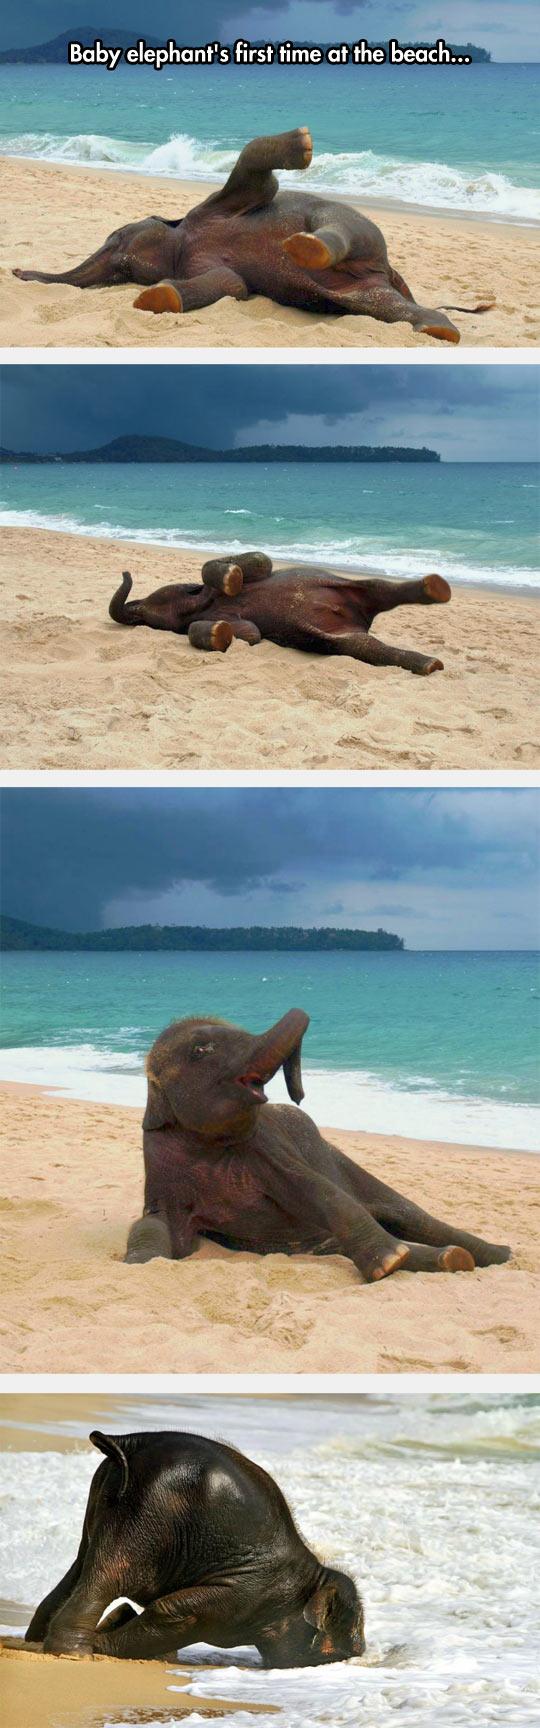 cool-elephant-first-time-beach-sand